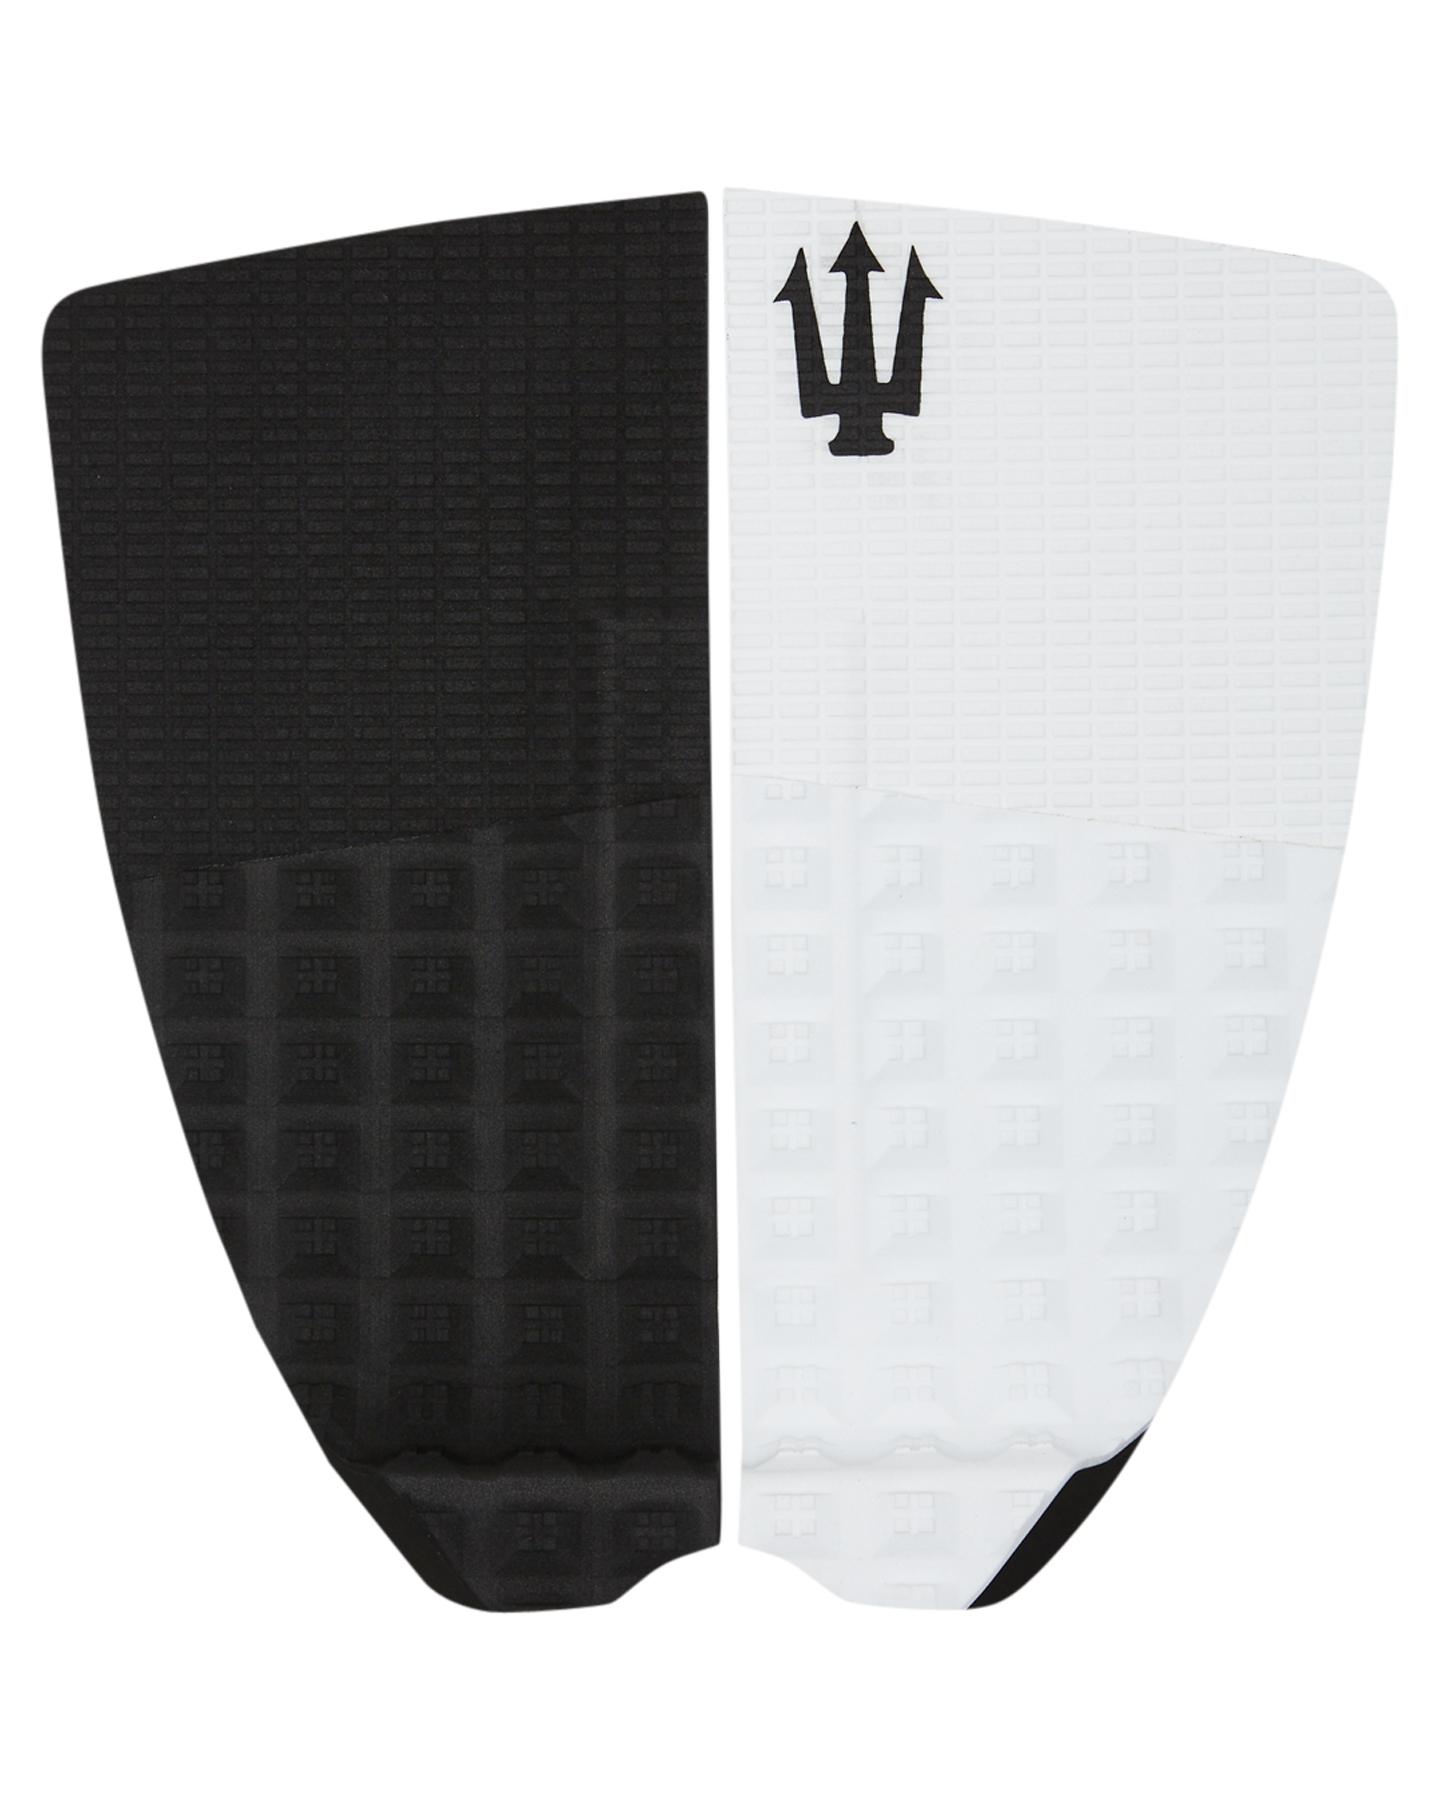 Fk Surf Split Tail Pad Black White